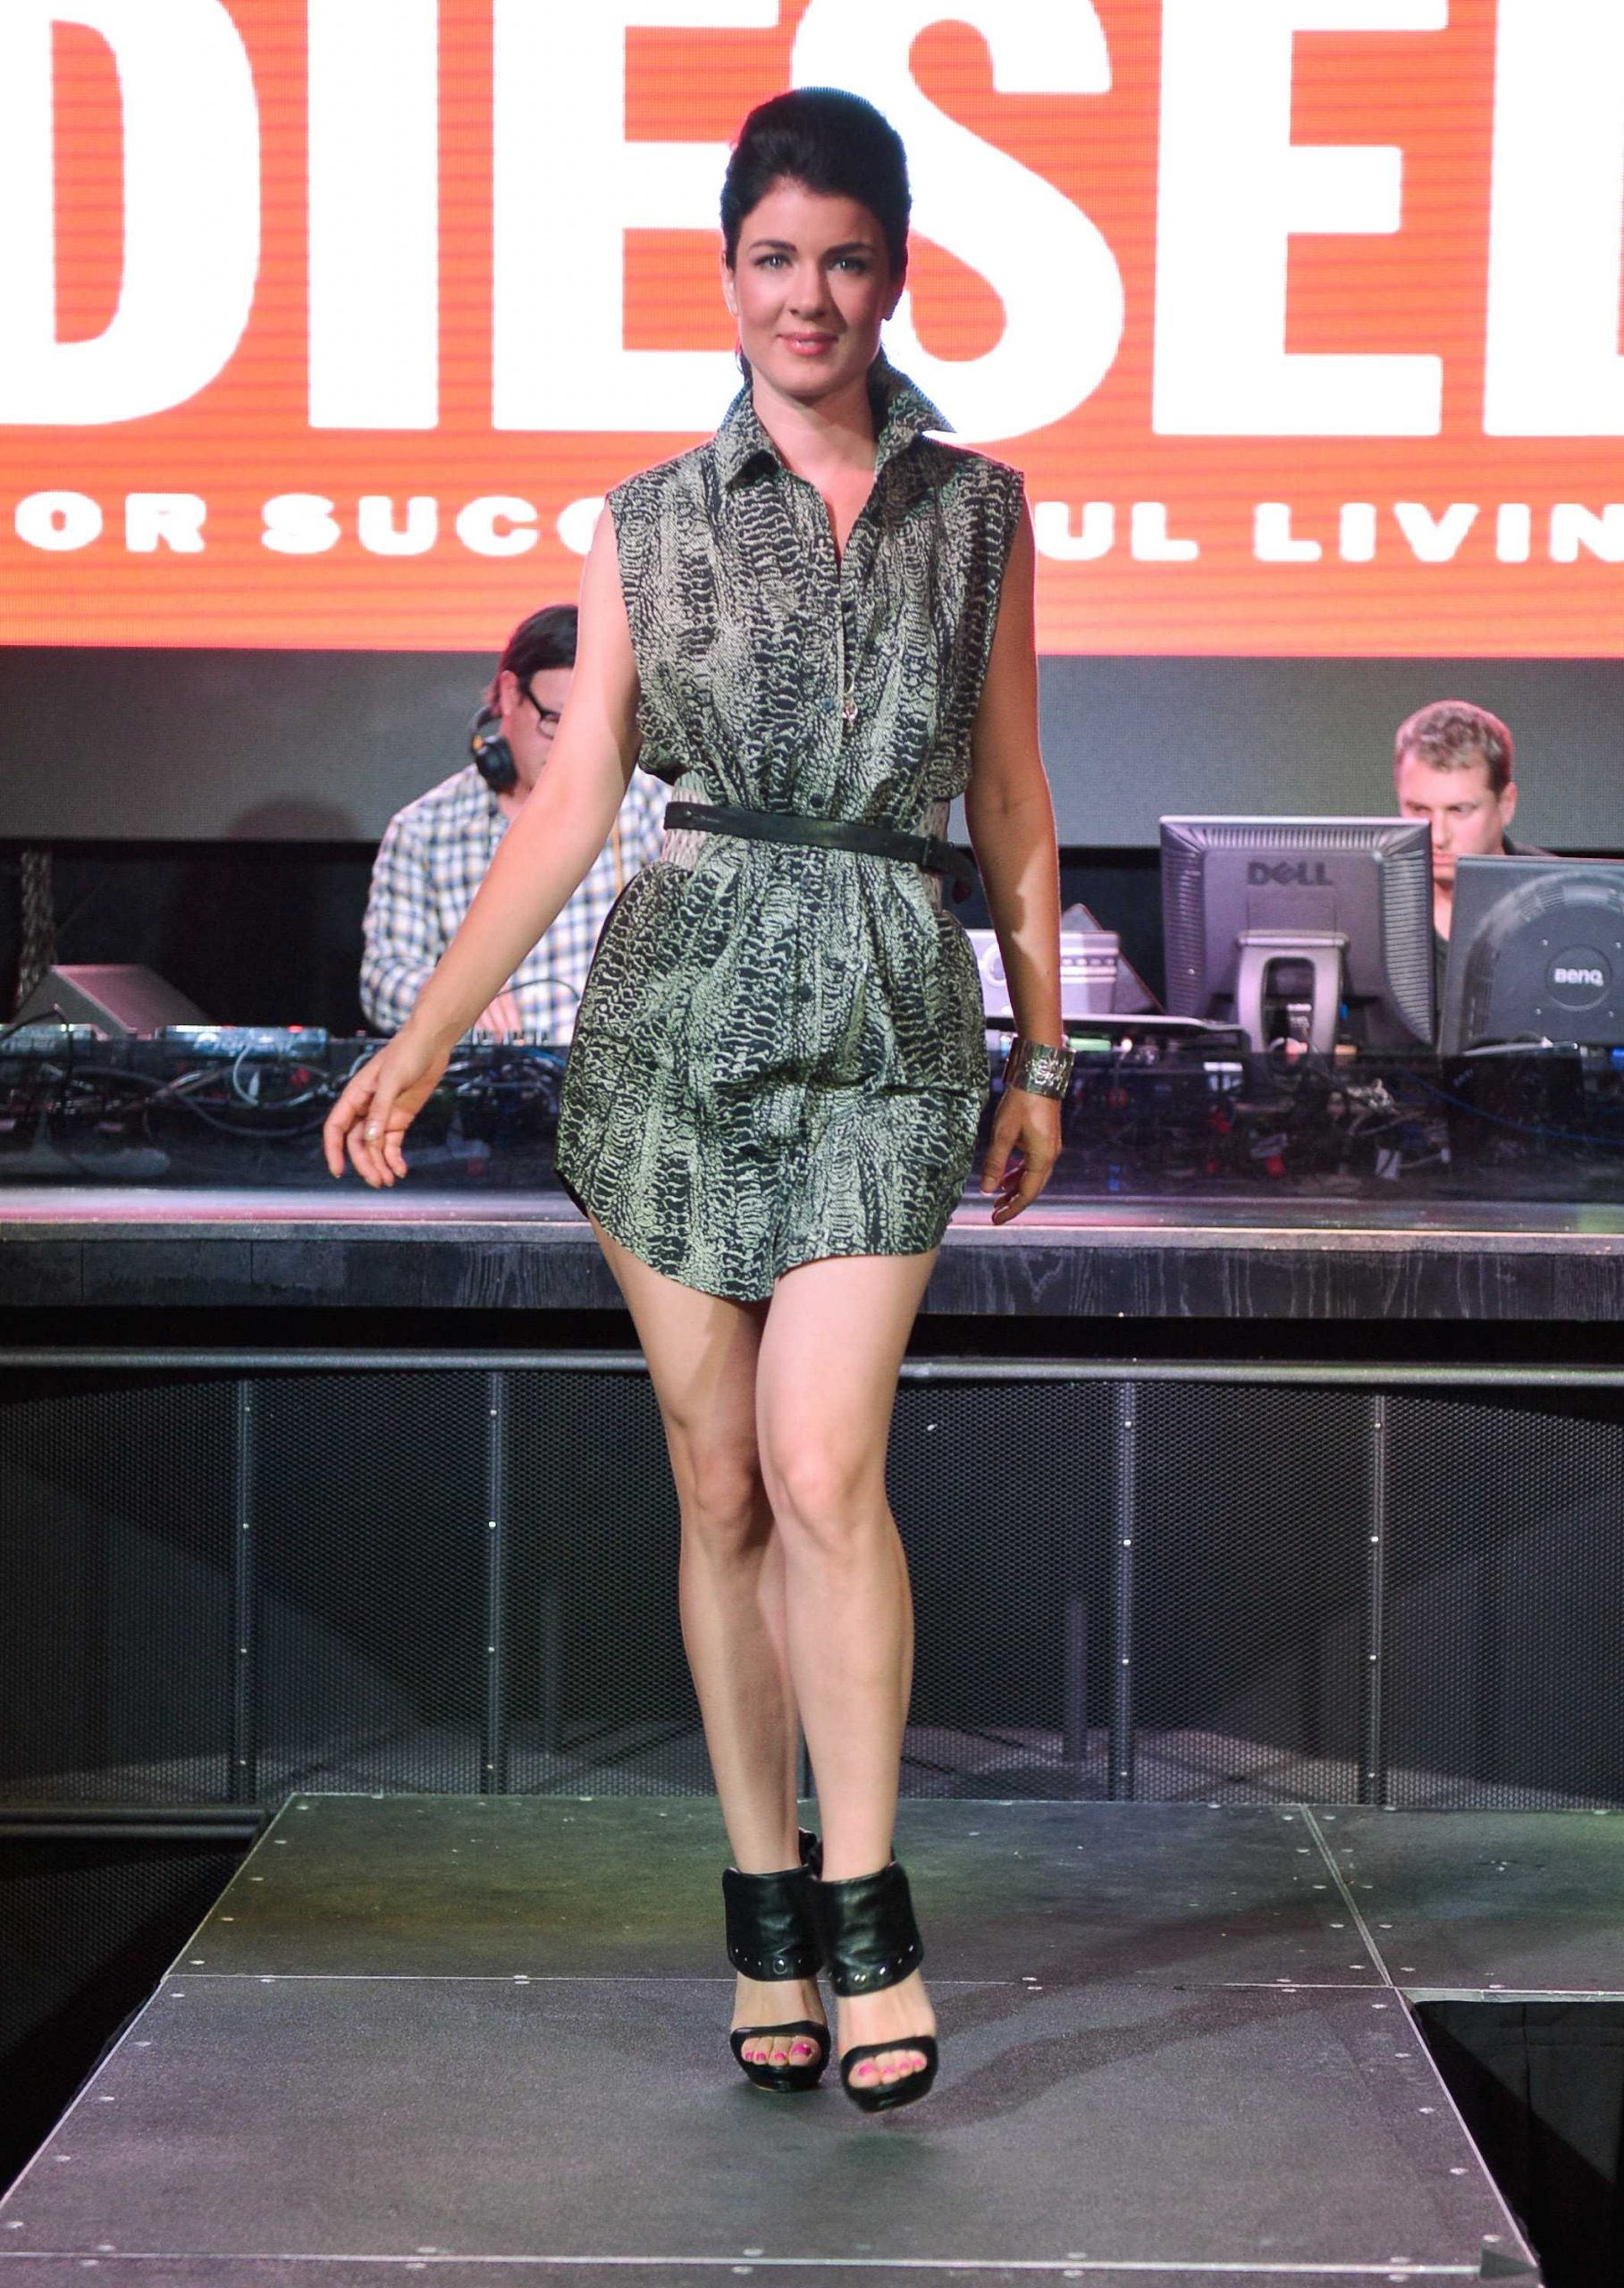 Gabrielle Miller sexy legs pic